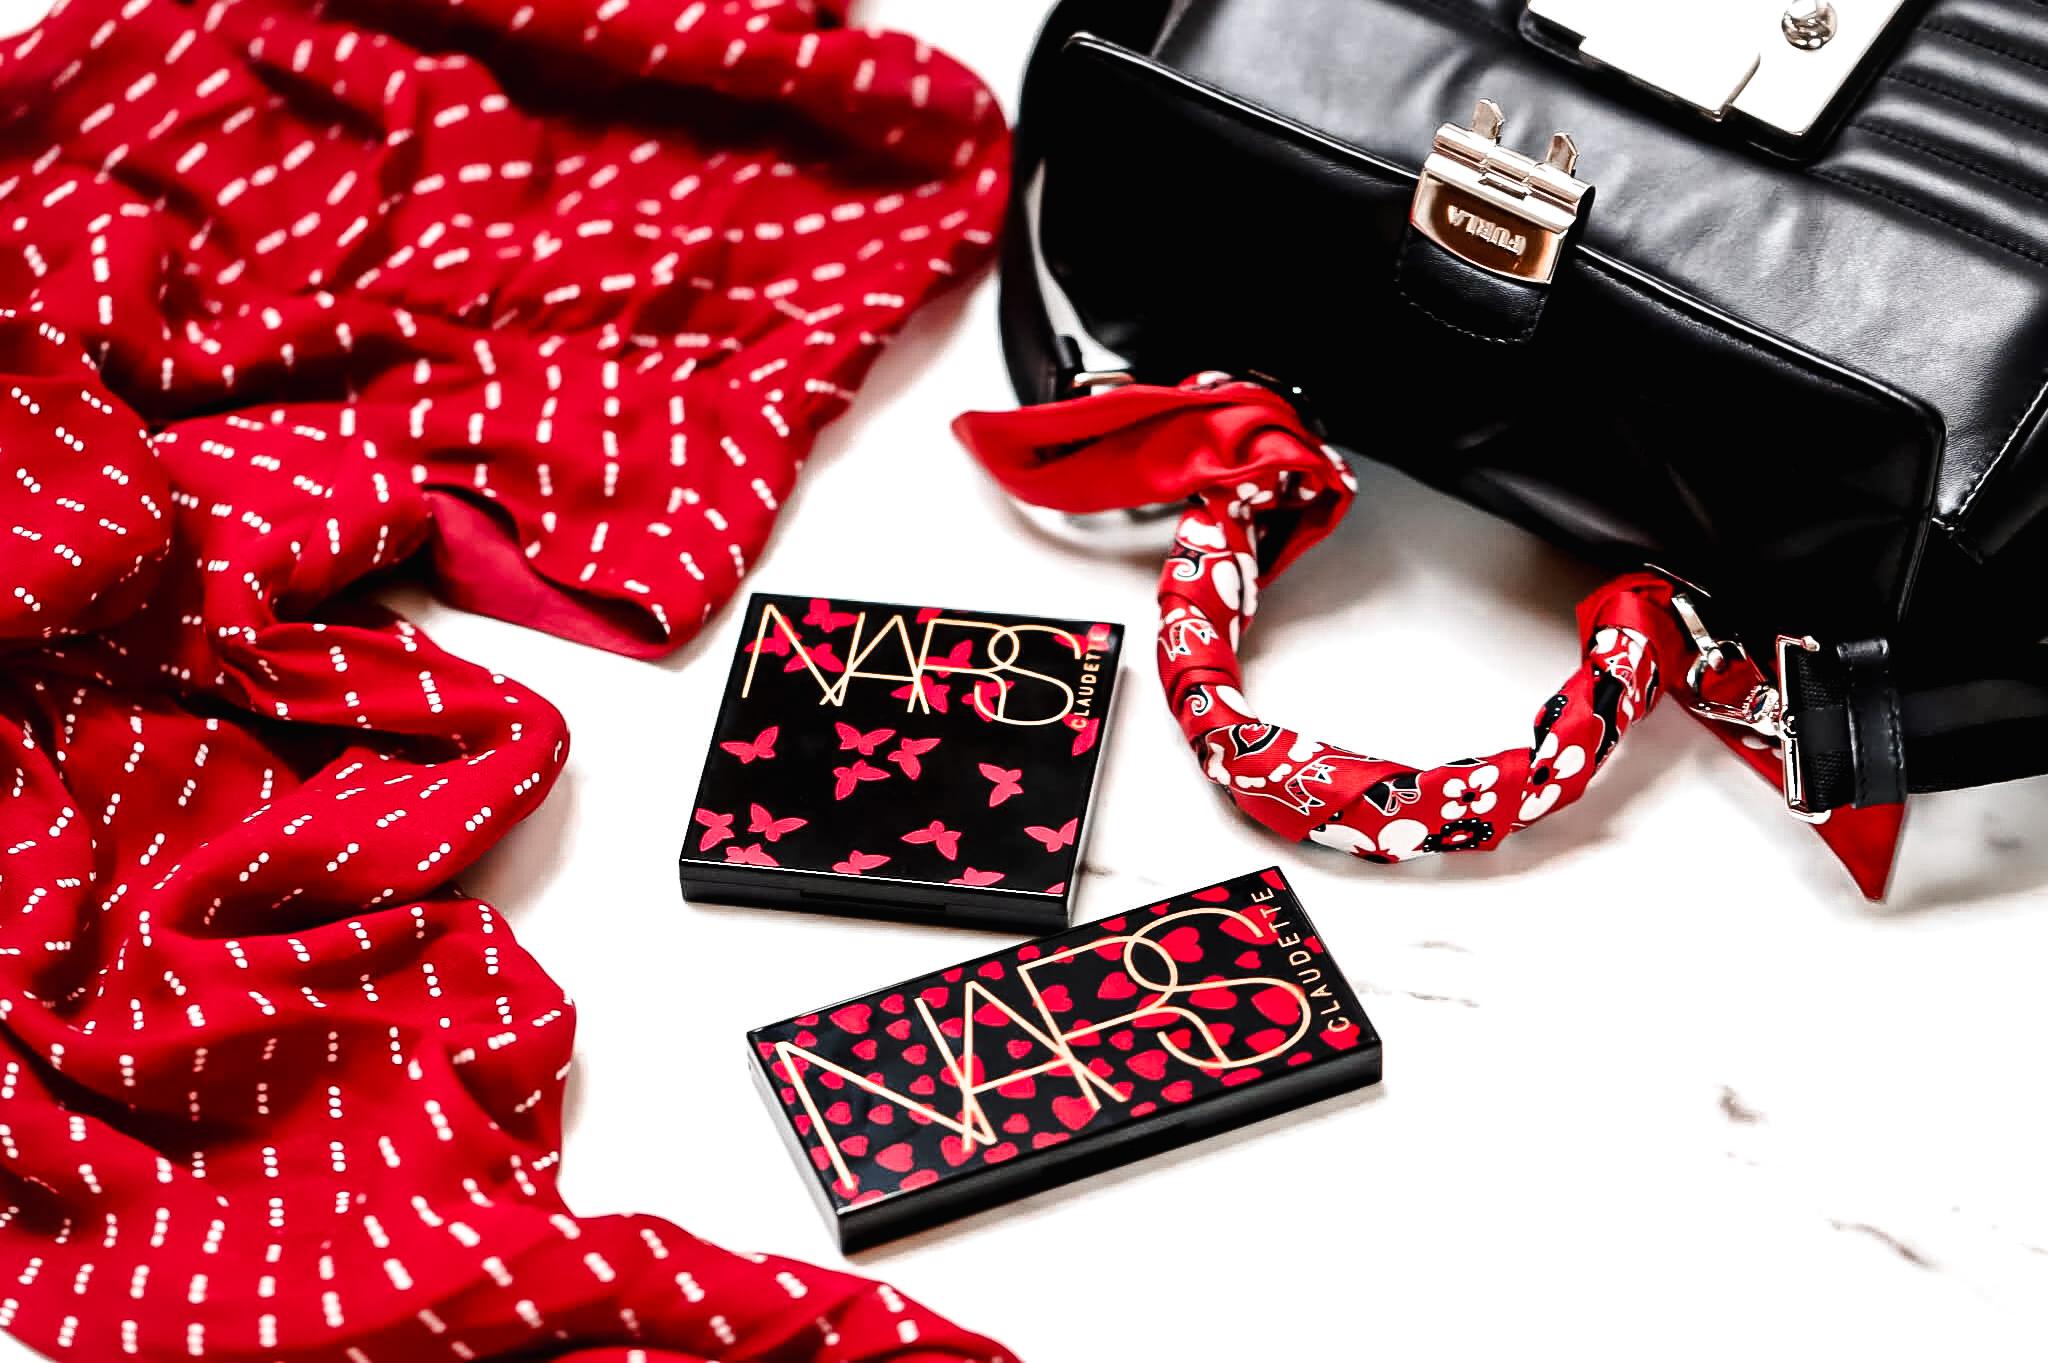 Nars Collection Claudette